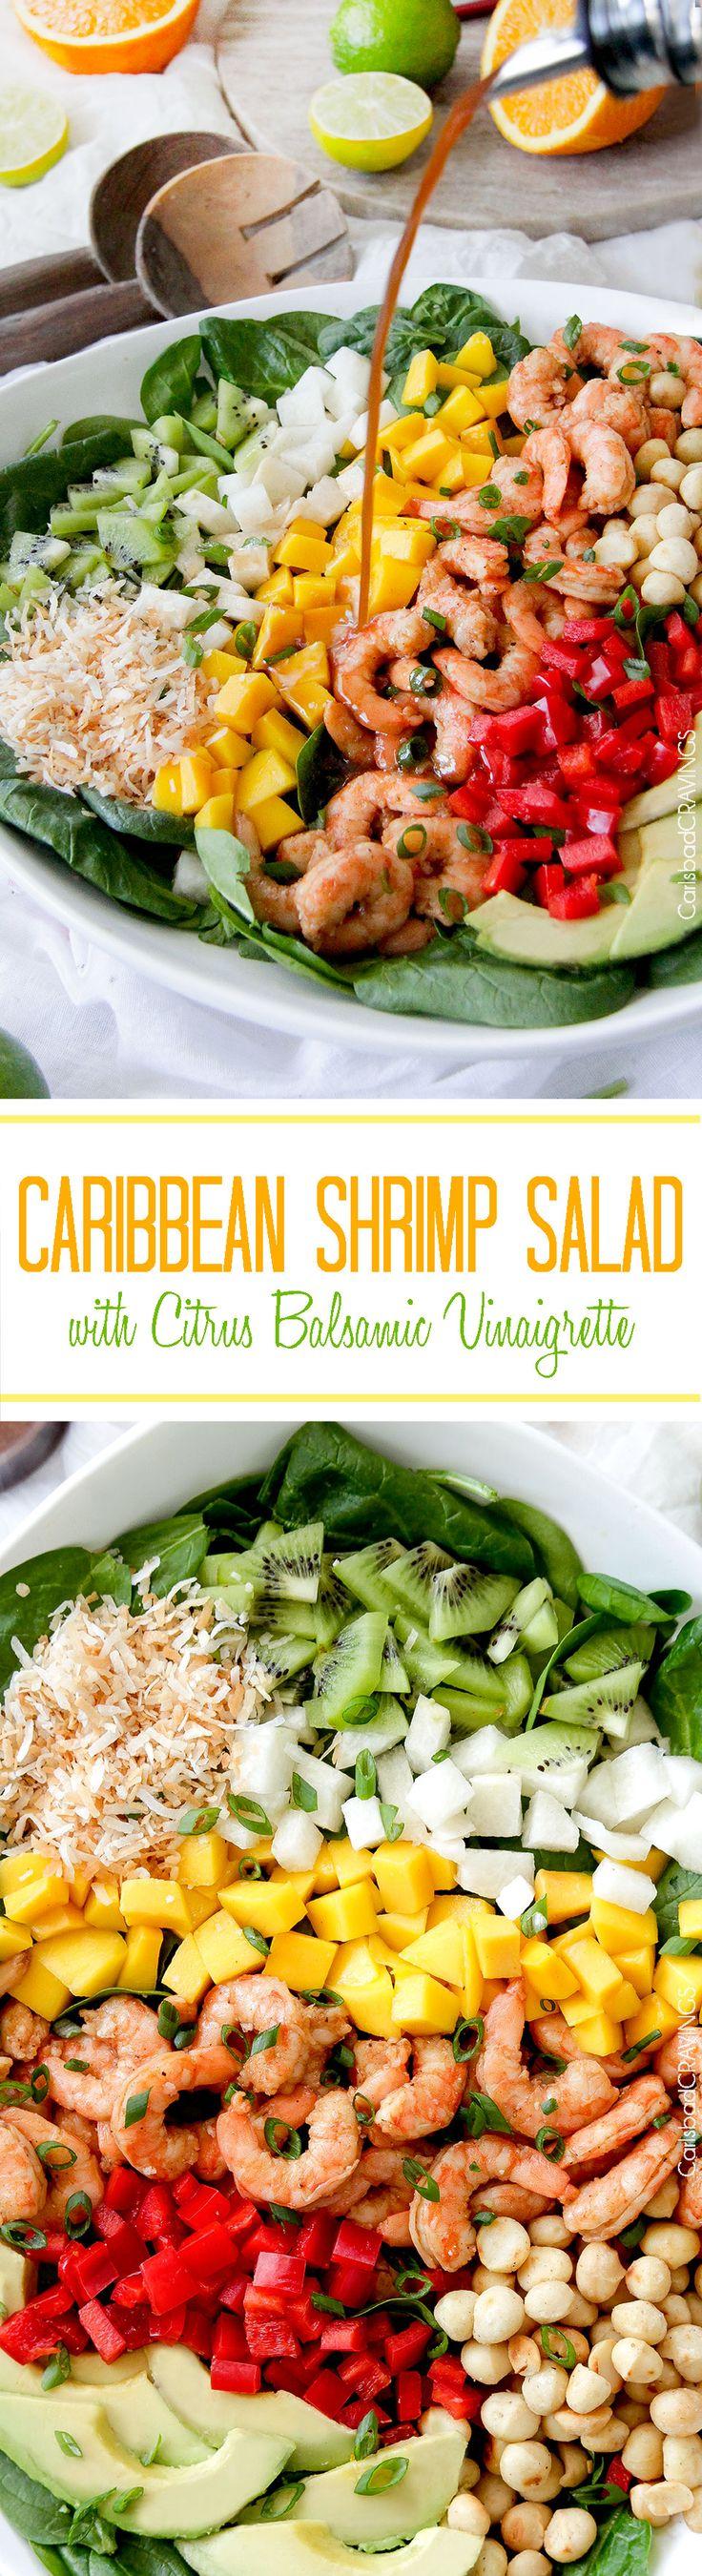 Caribbean Shrimp Salad with Citrus Balsamic Vinaigrette | Carlsbad Cravings